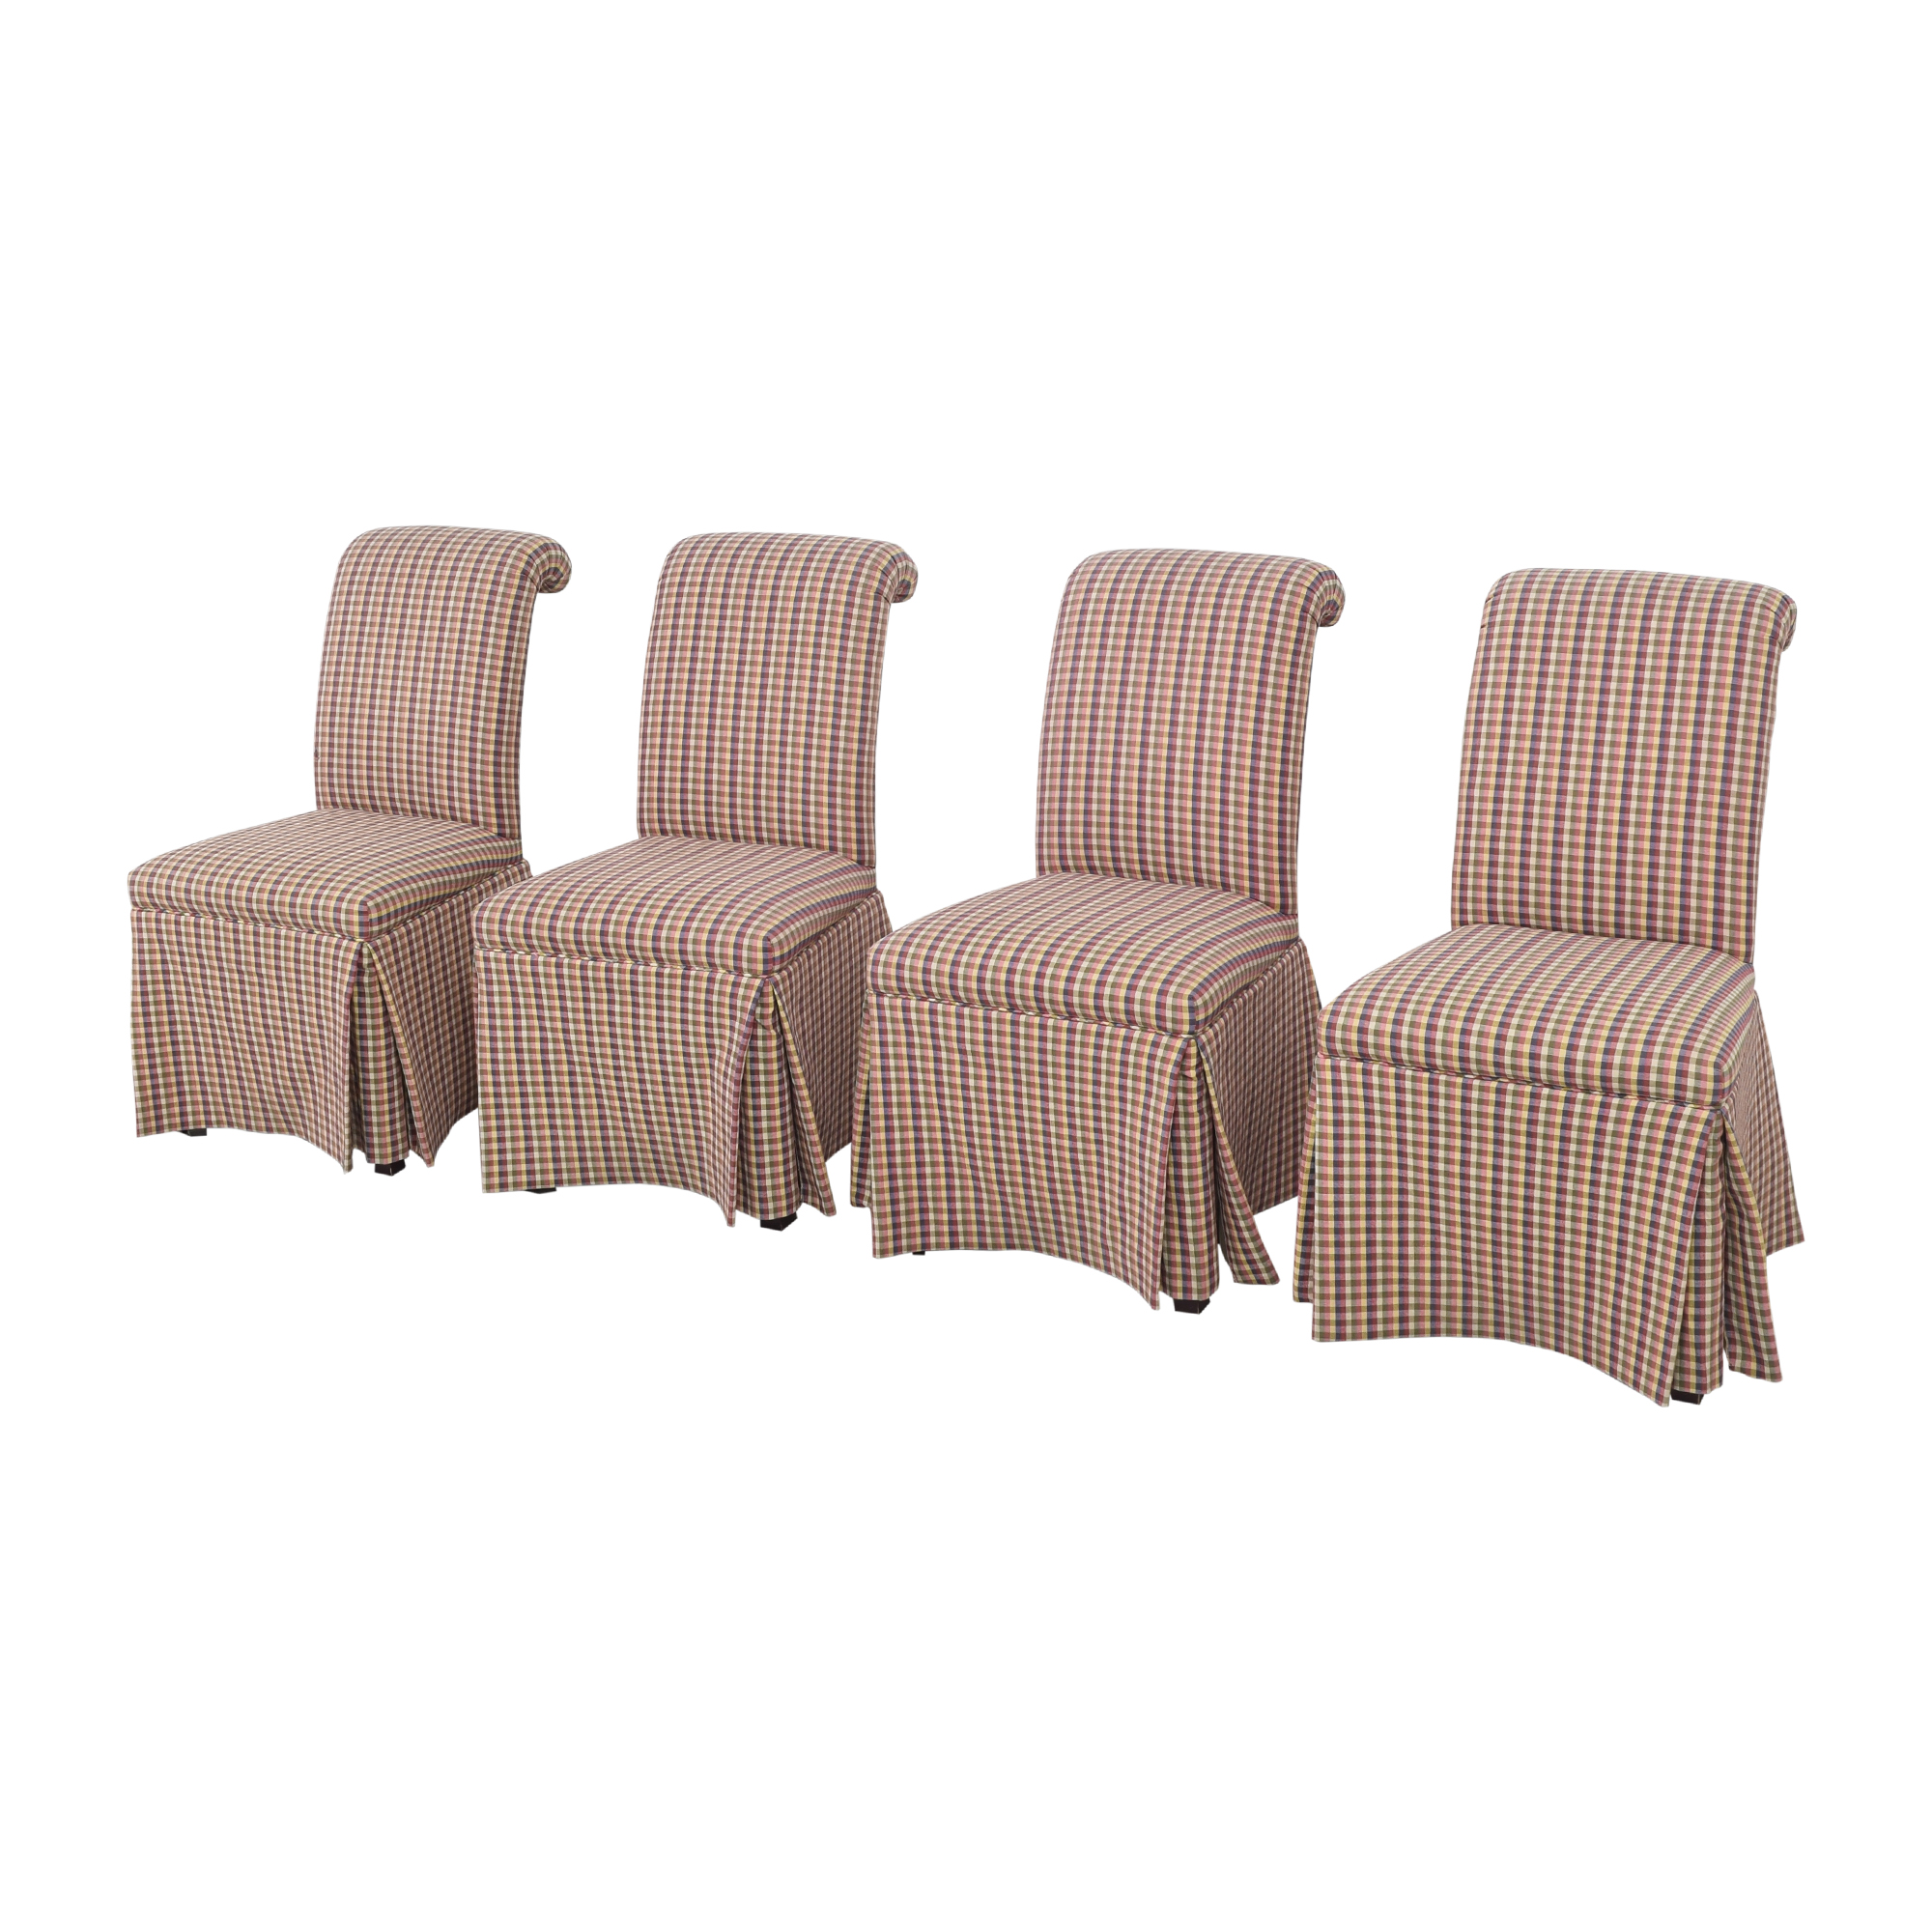 Sherrill Furniture Sherrill Furniture Slipcovered Scroll Top Dining Chairs pa